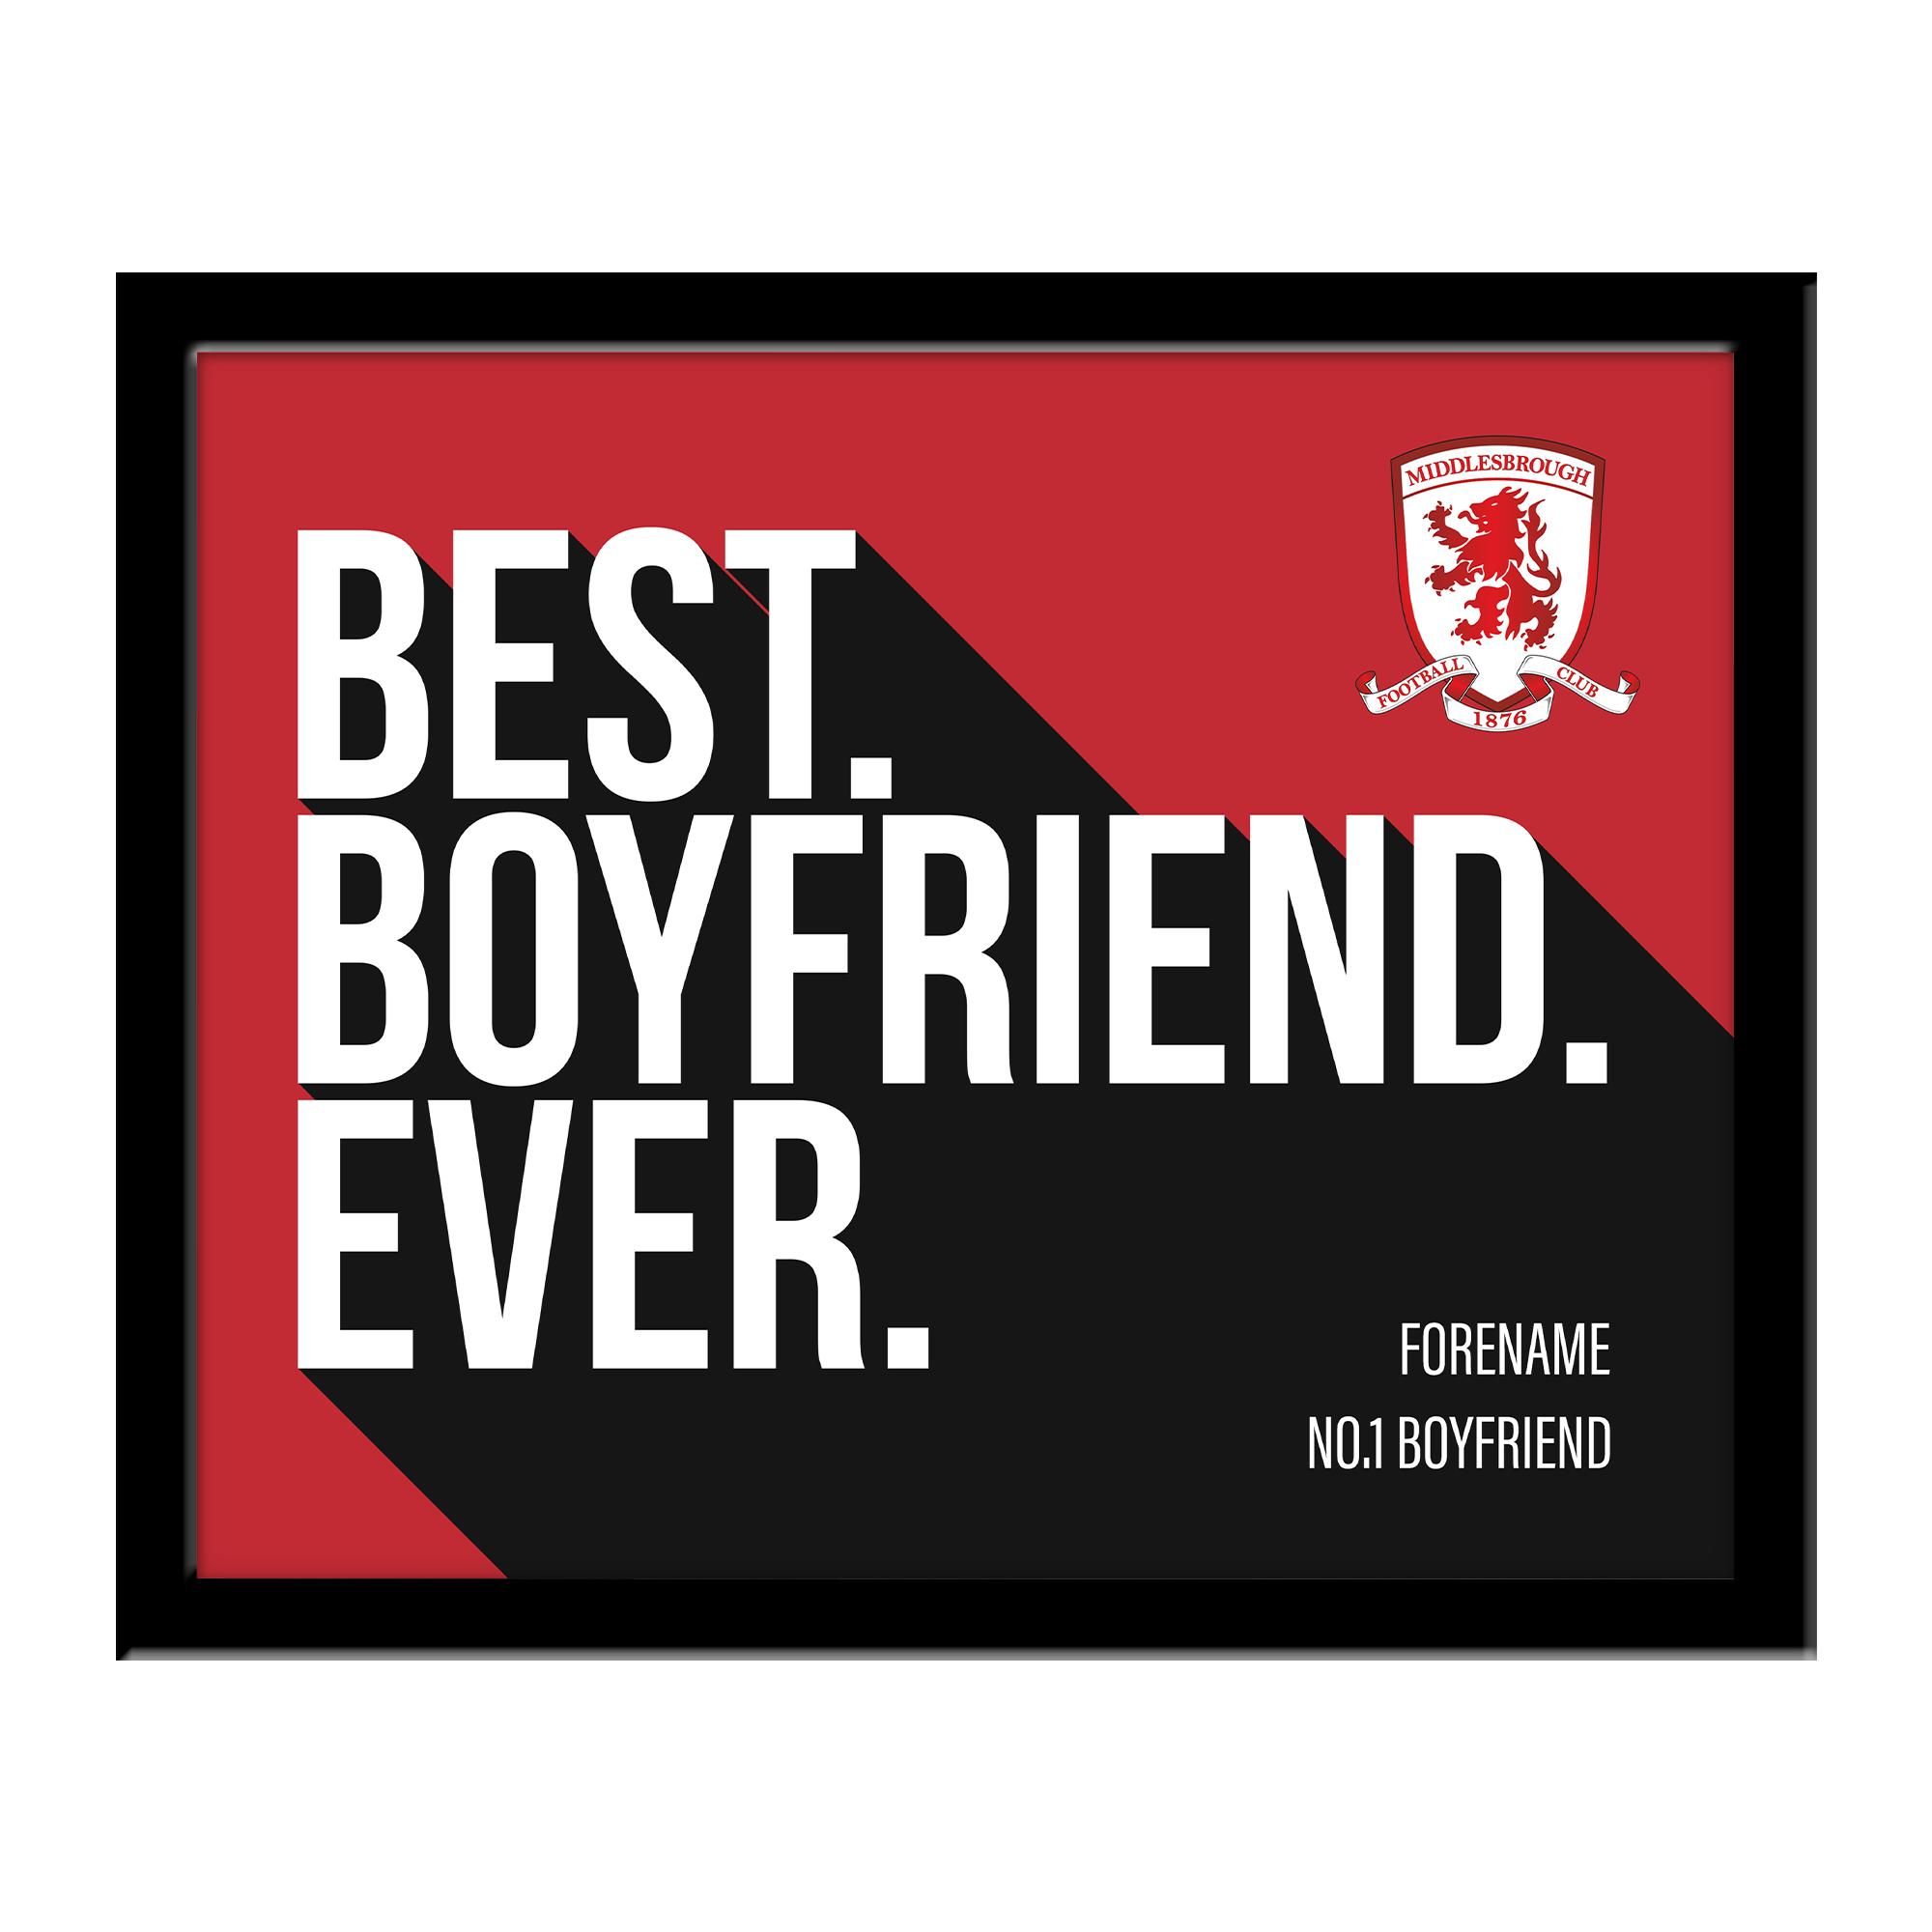 Middlesbrough Best Boyfriend Ever 10 x 8 Photo Framed